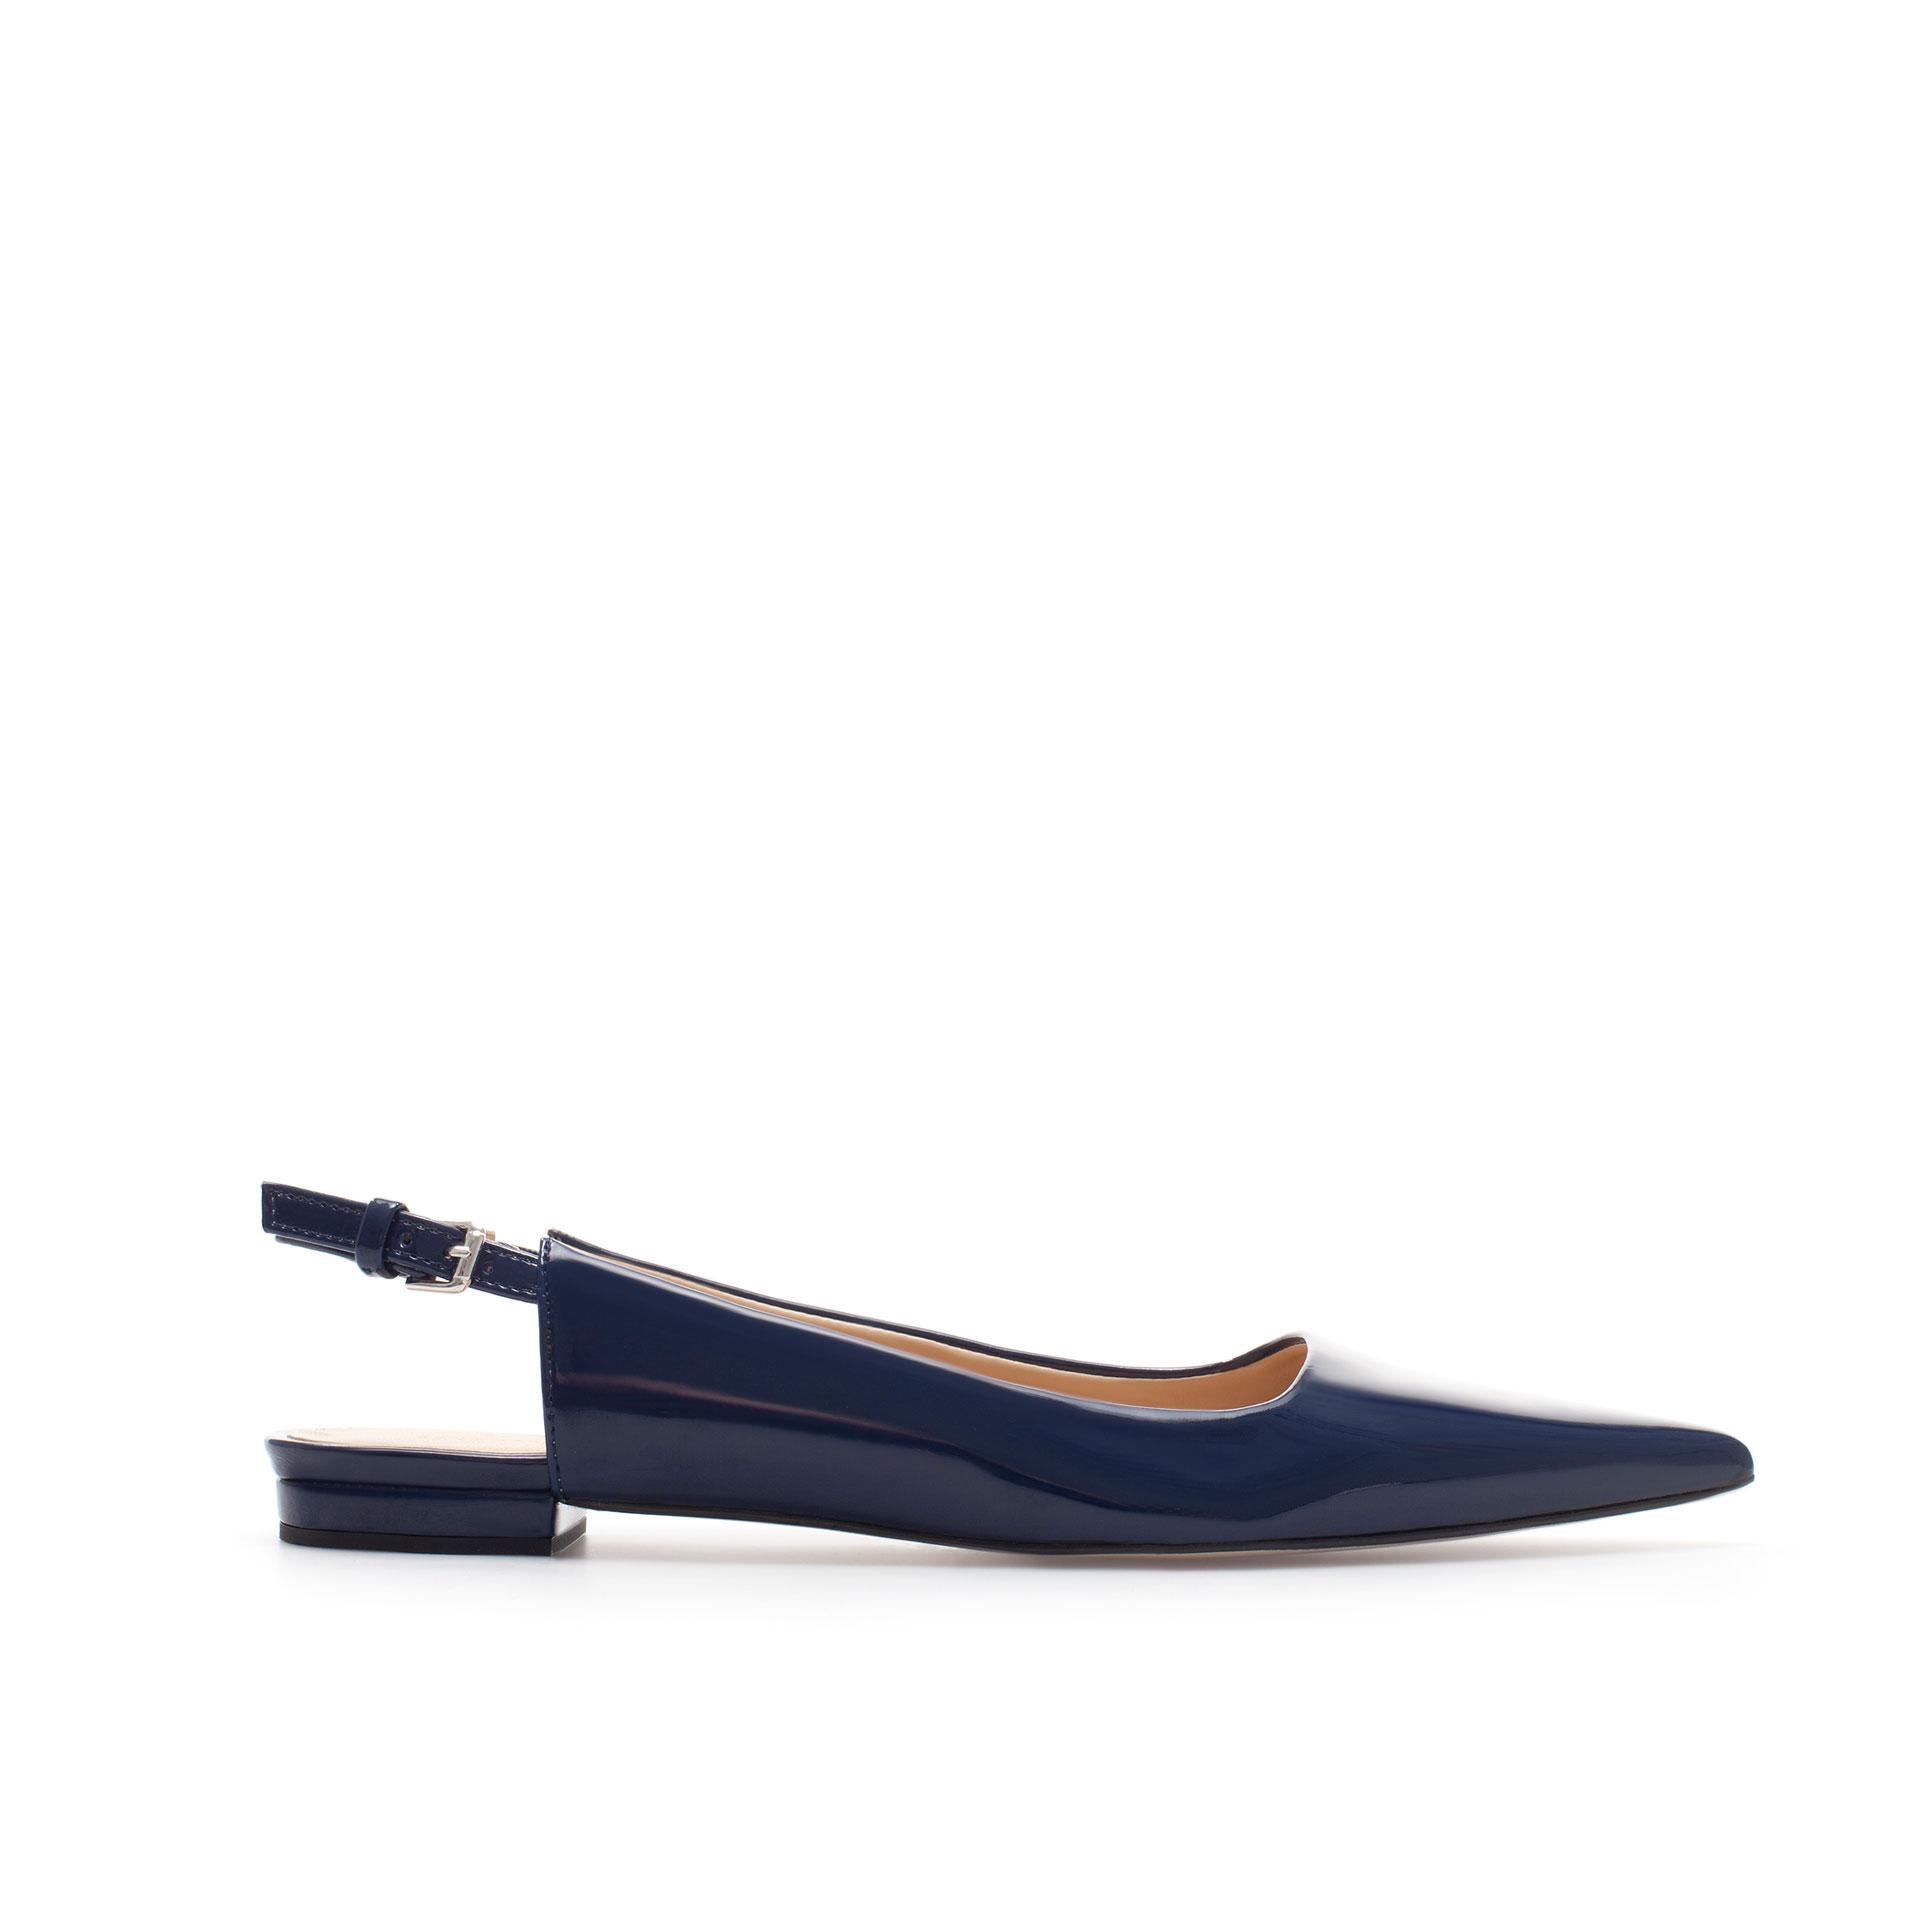 Flat Pointed Toe Slingback Shoes